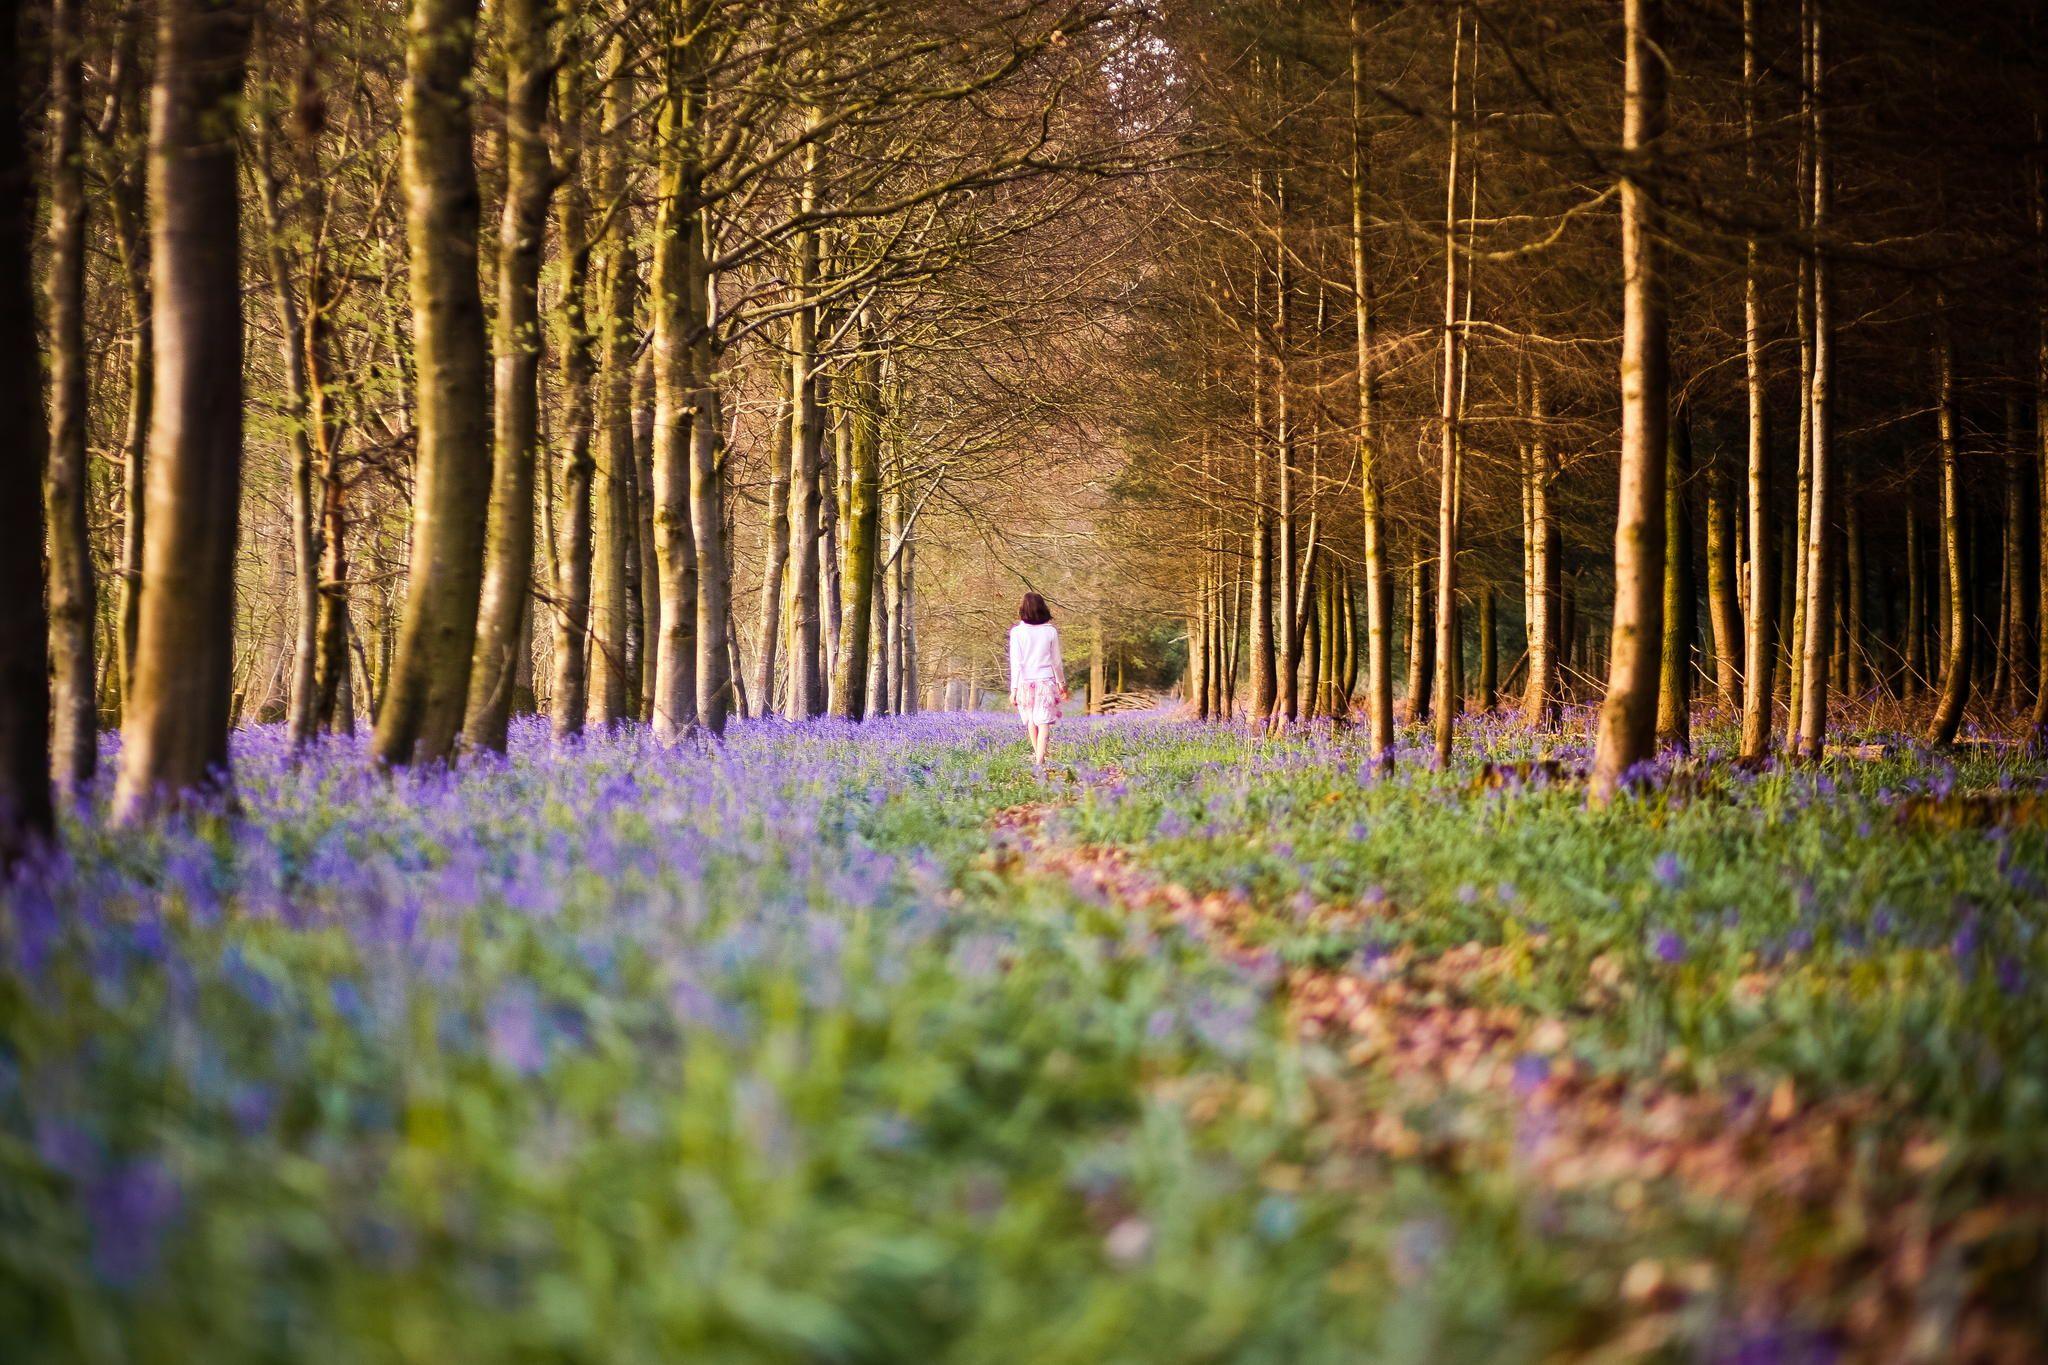 Bluebell Woodland by Sasha L'Estrange-Bell on 500px